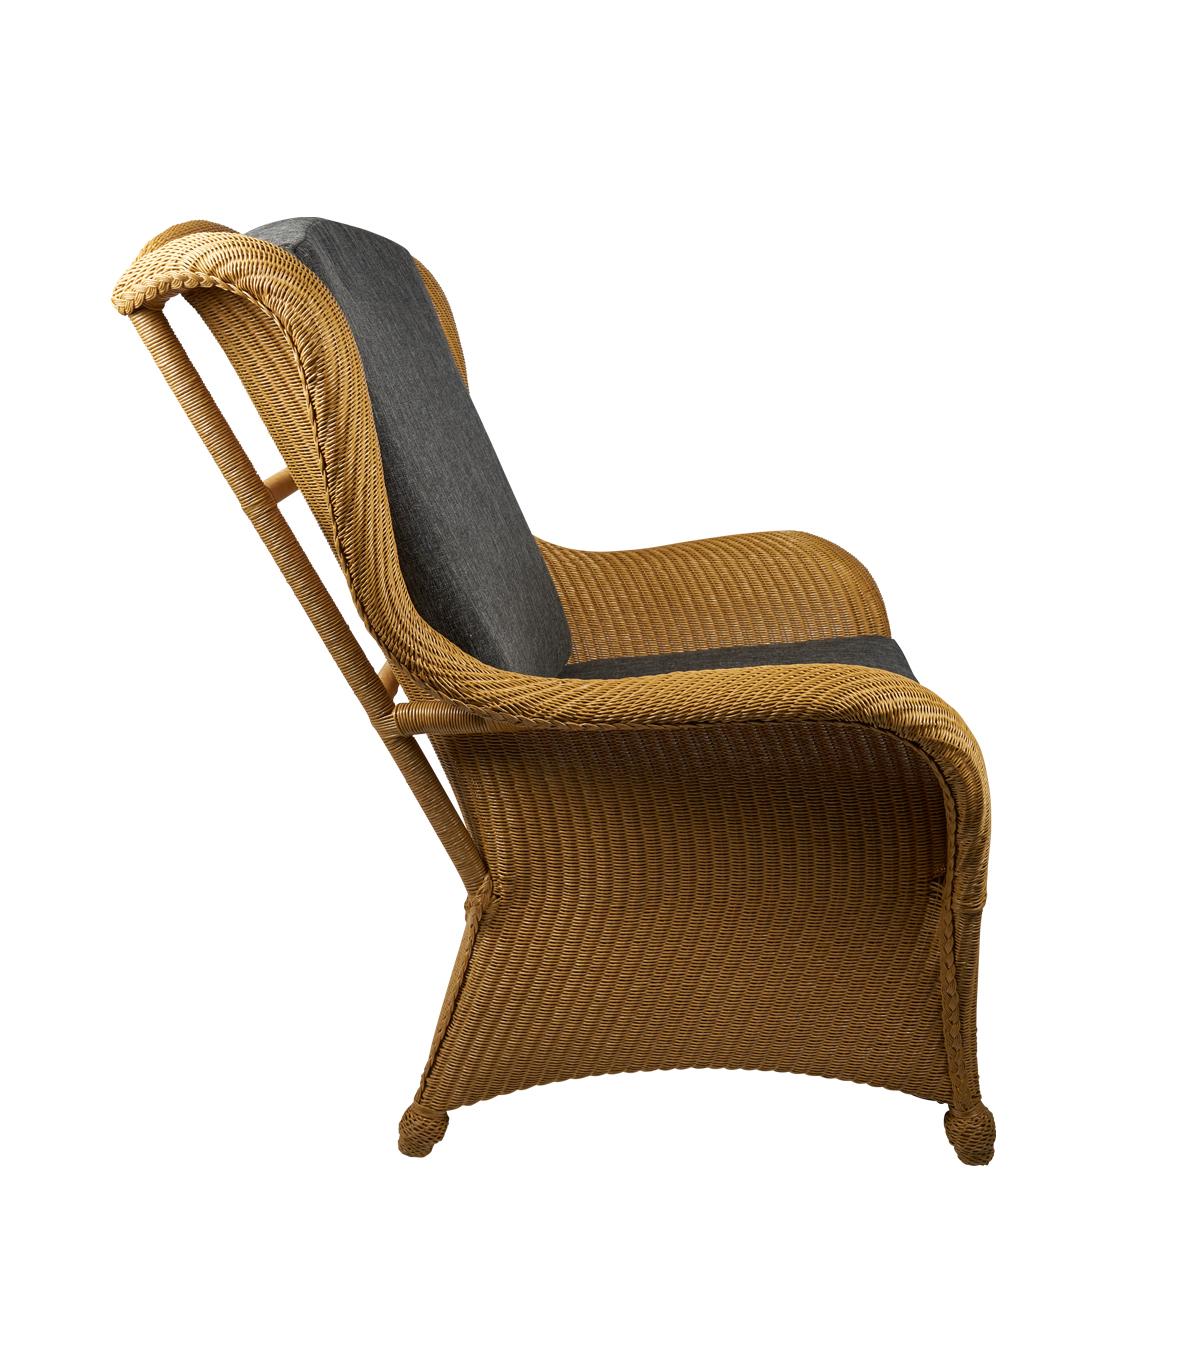 Lloyd loom Sessel King Chair Super Naturell Sessel Lloyd loom Shop24